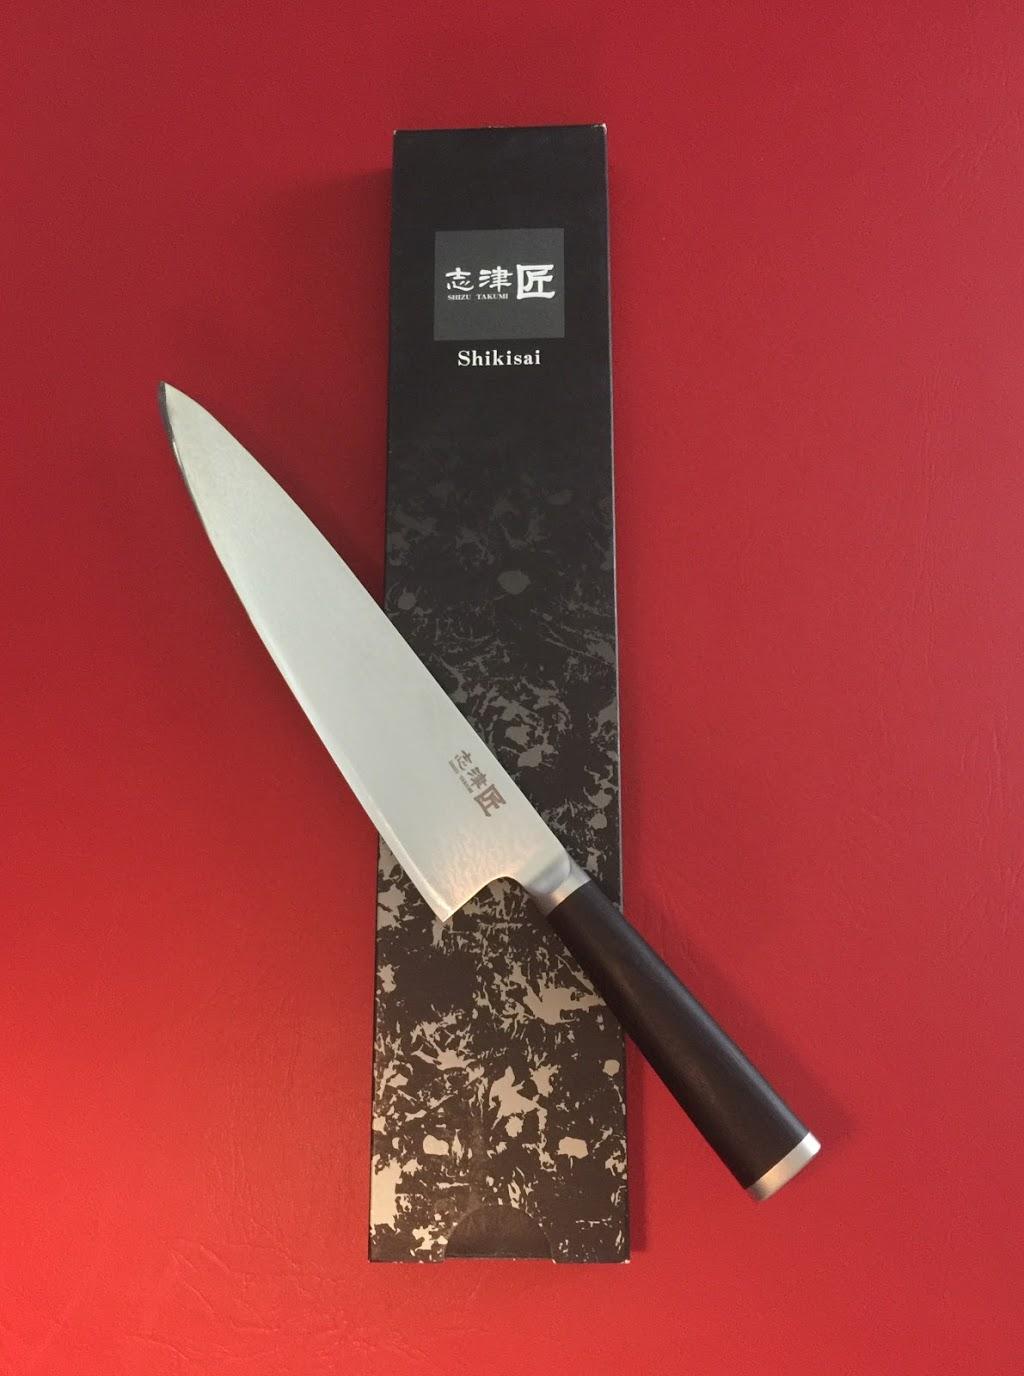 Ogg Sharpening & Knife Store, Gift Shop Selling Fine Knives Aust | store | 248 Upper Dawson Rd, Allenstown QLD 4700, Australia | 0427343197 OR +61 427 343 197